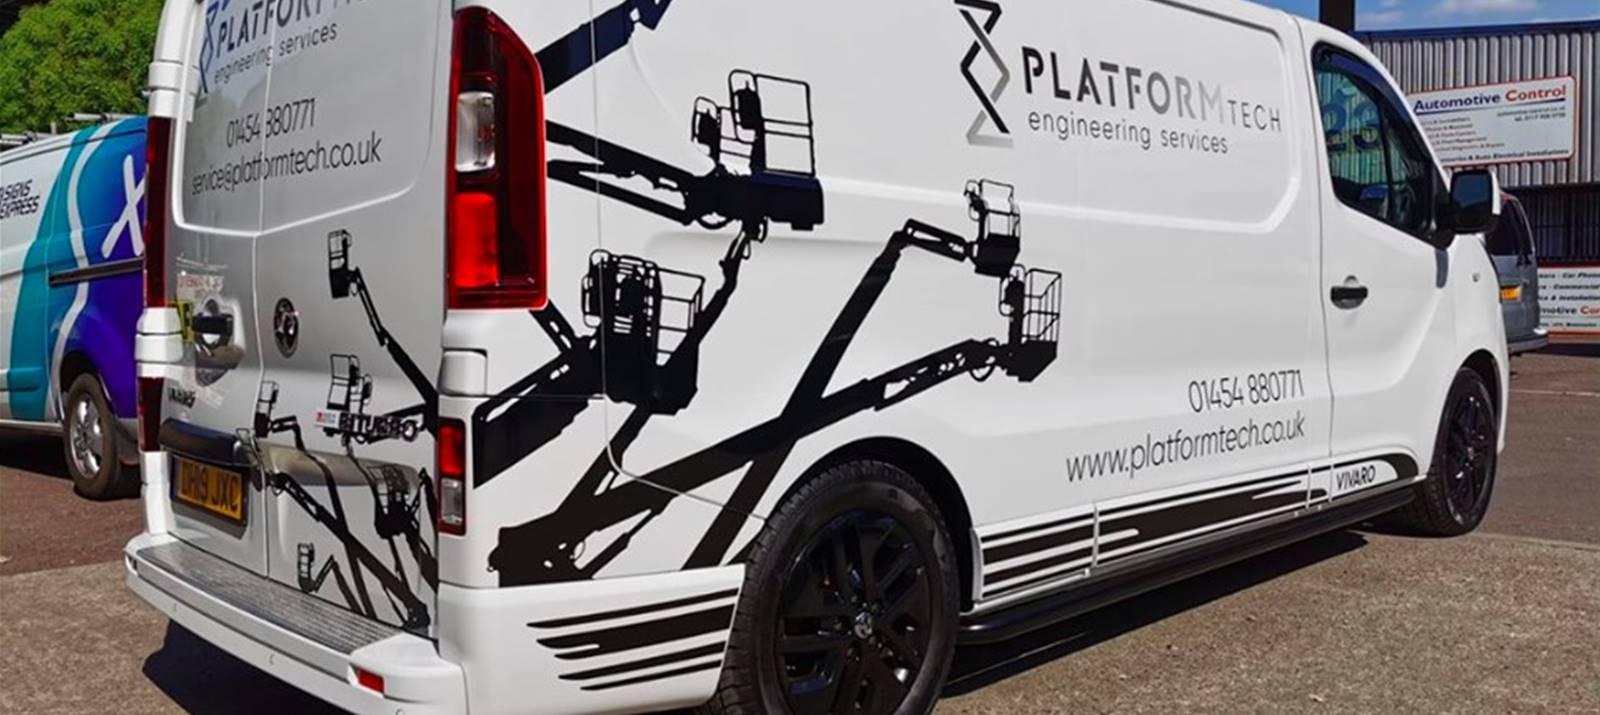 Vehicle graphics for Platformtech Engineering